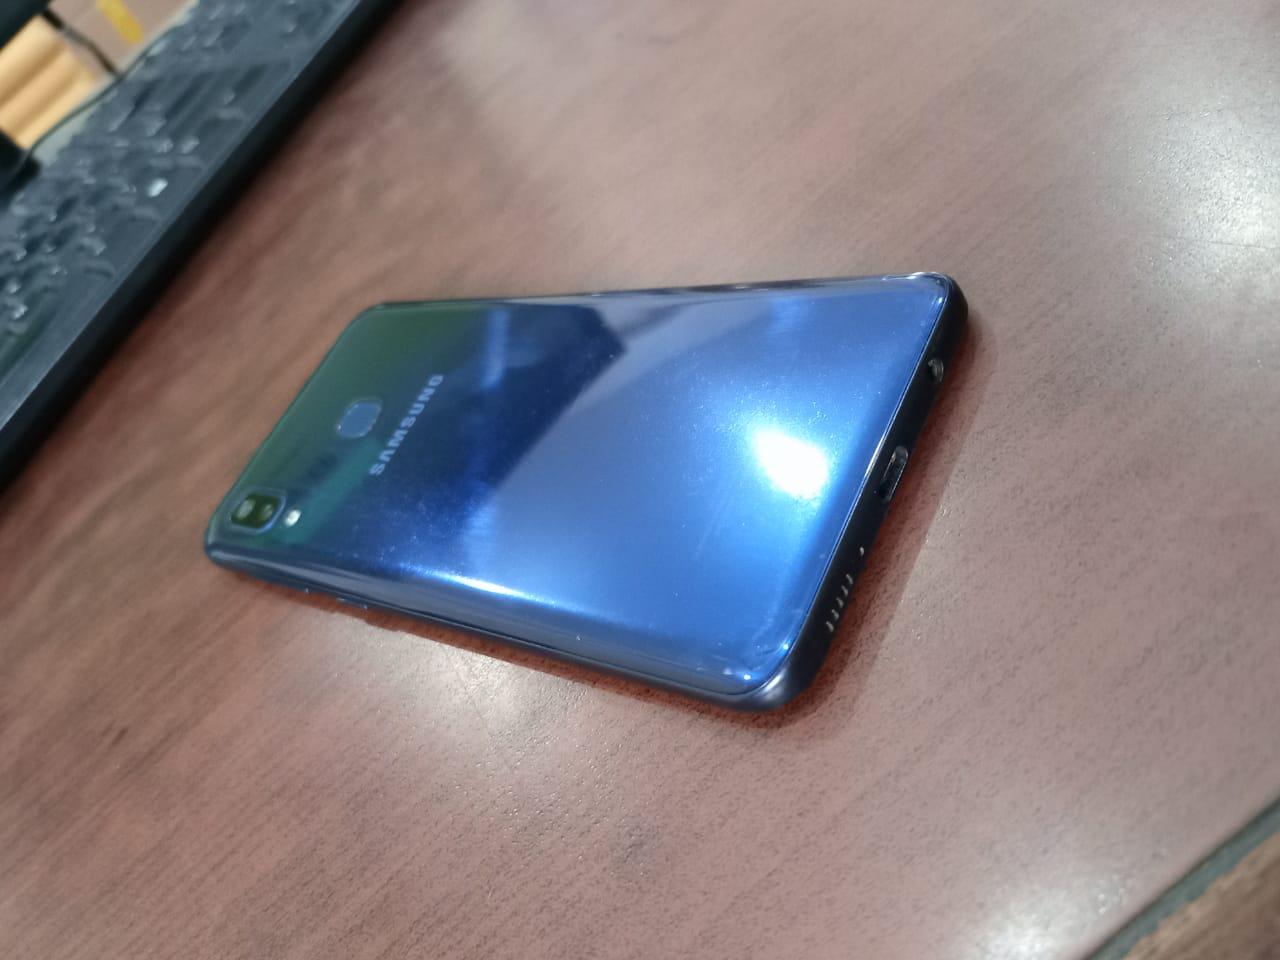 Samsung Galaxy good condition 10/10